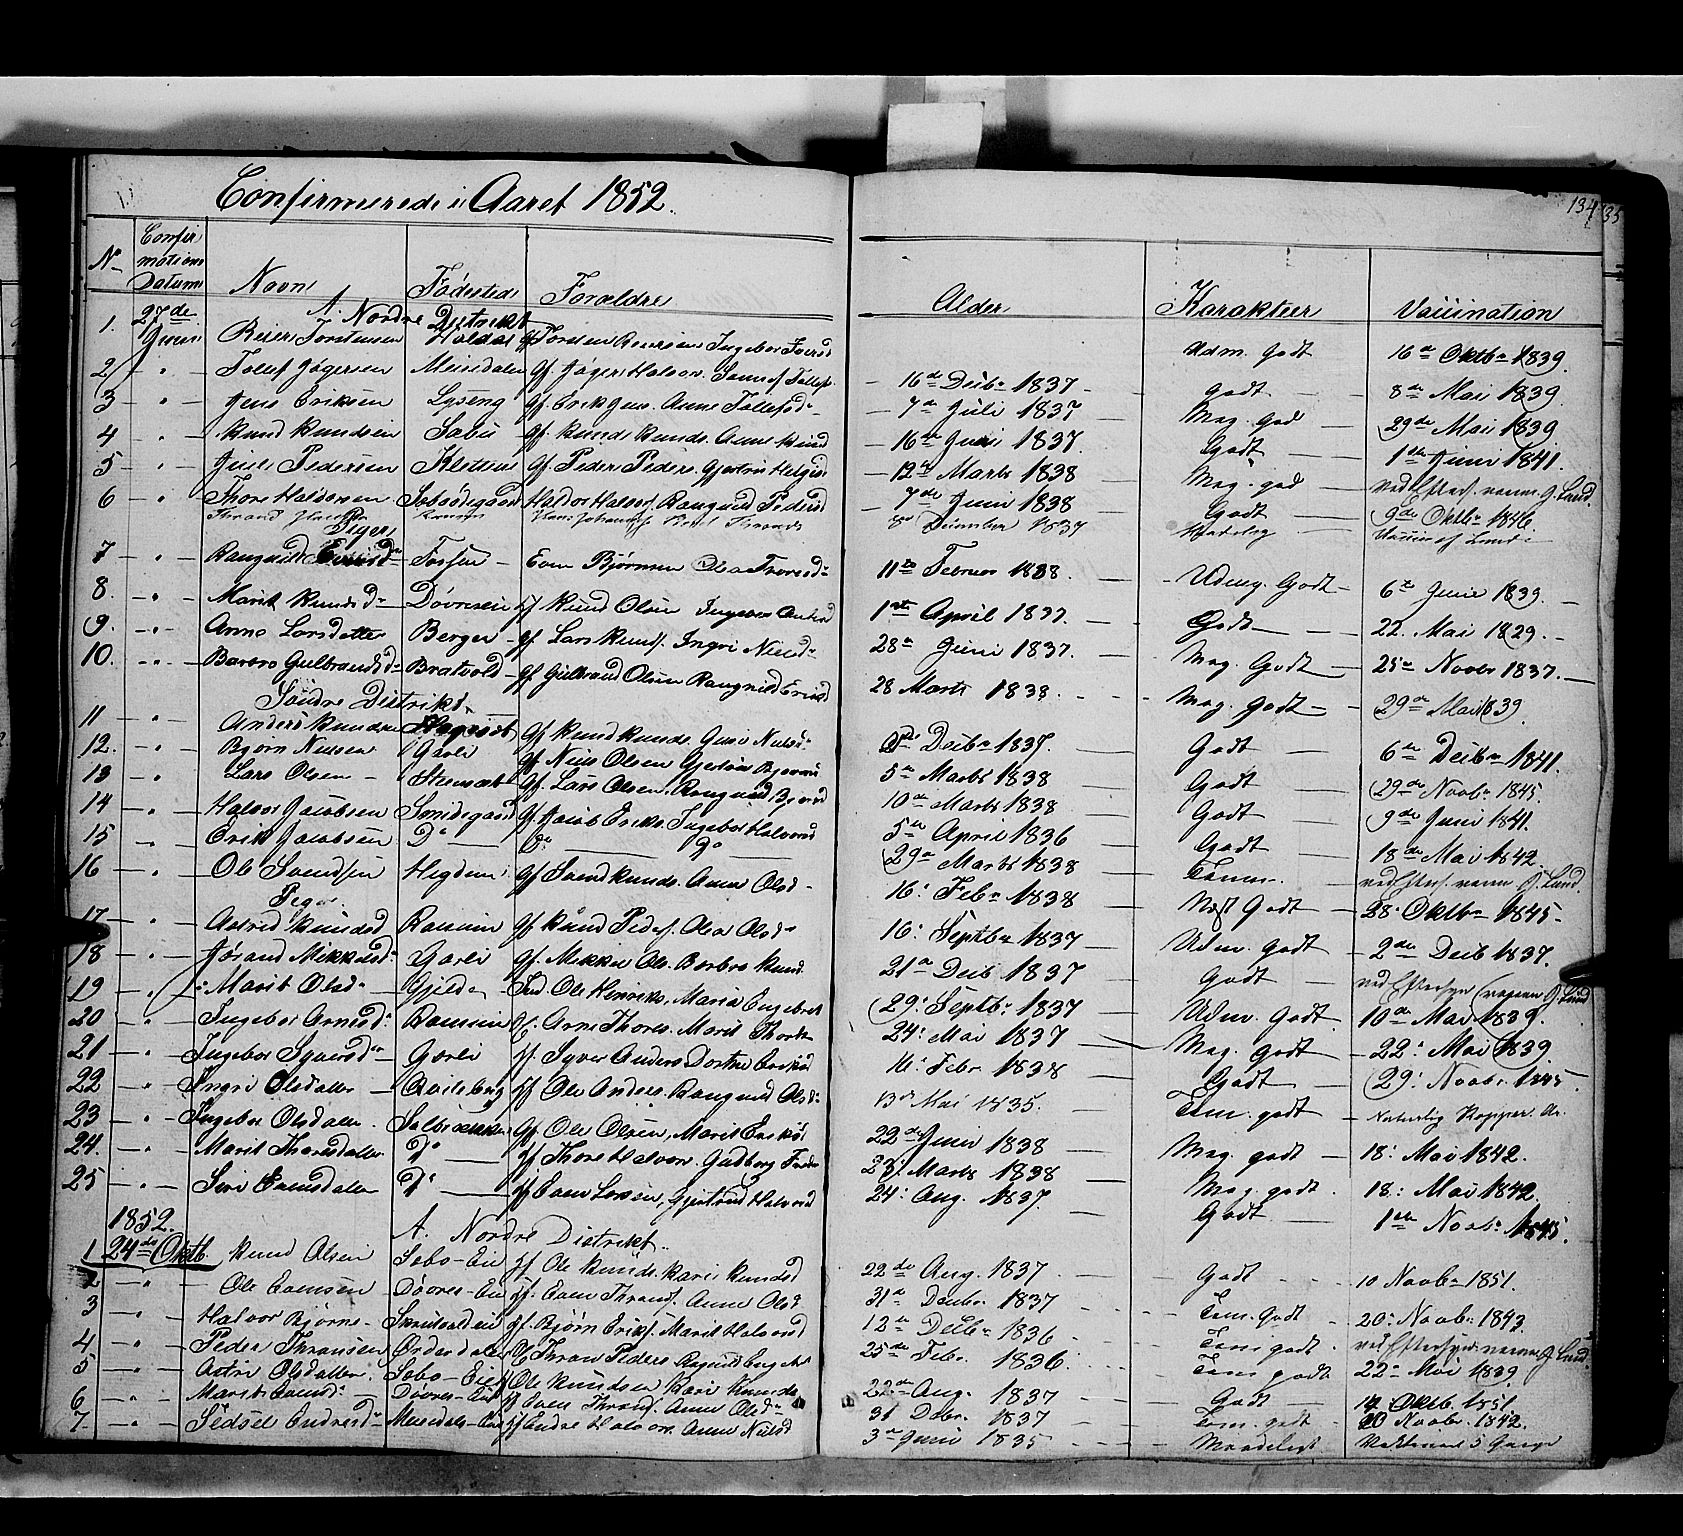 SAH, Nord-Aurdal prestekontor, Ministerialbok nr. 7, 1842-1863, s. 134